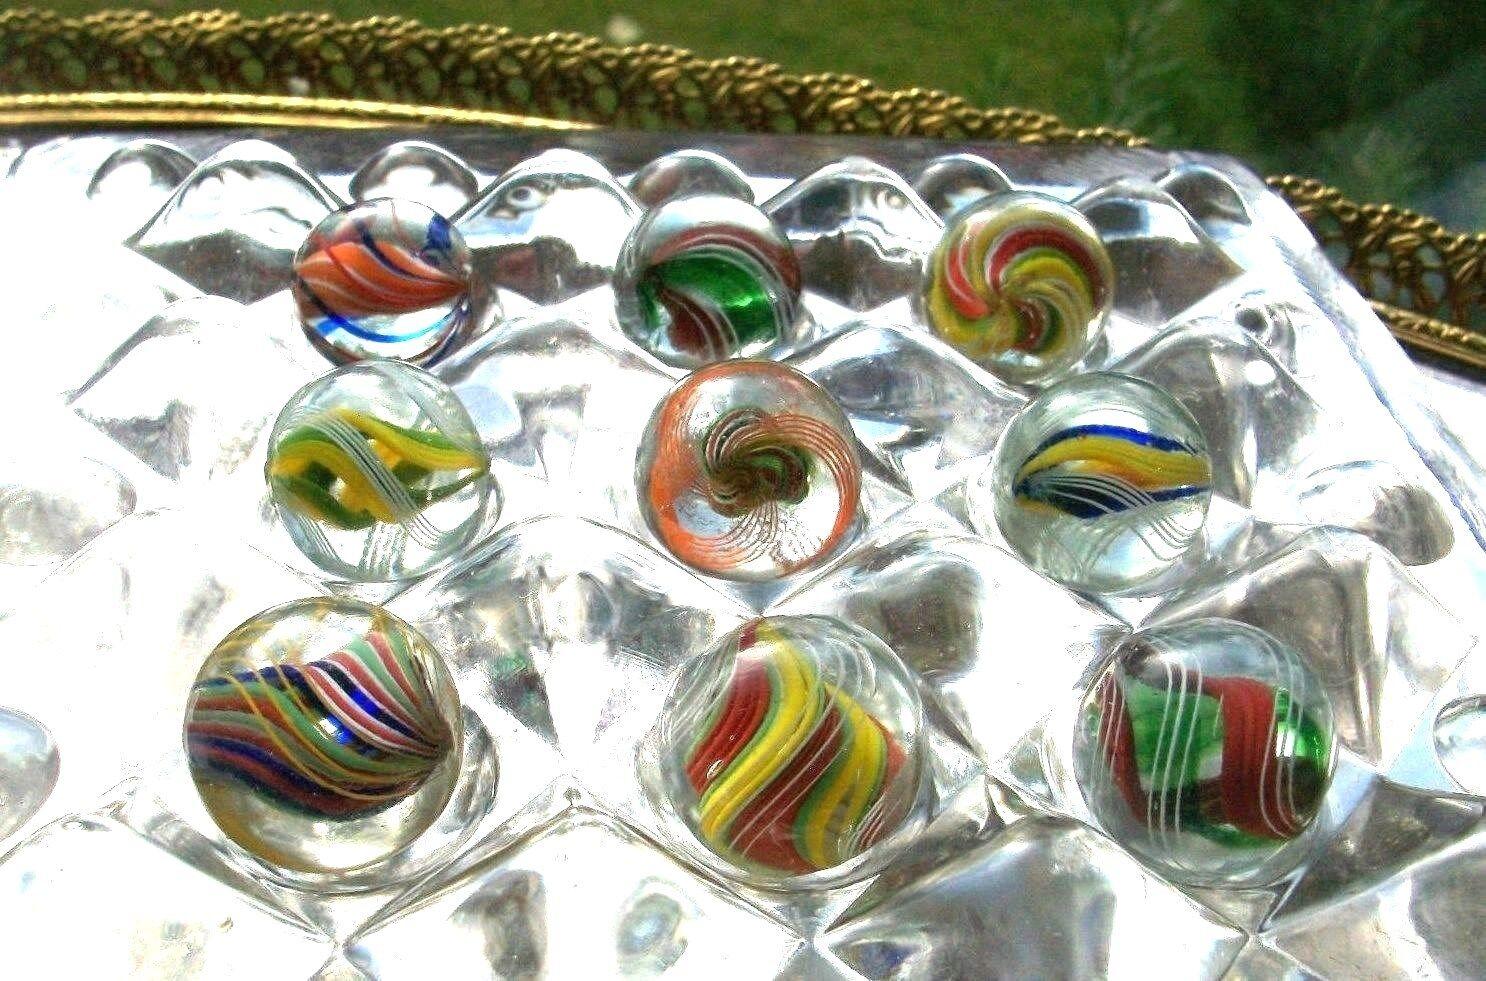 Antiguo Glass Marbles Remolino cinta Core + Vidrio Mármol Display Stand soporte Raro